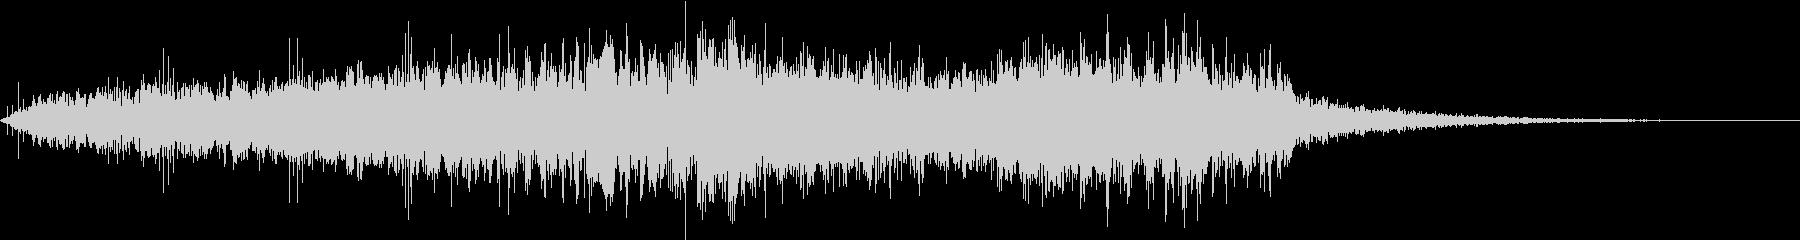 CINEMATIC RISER_15の未再生の波形